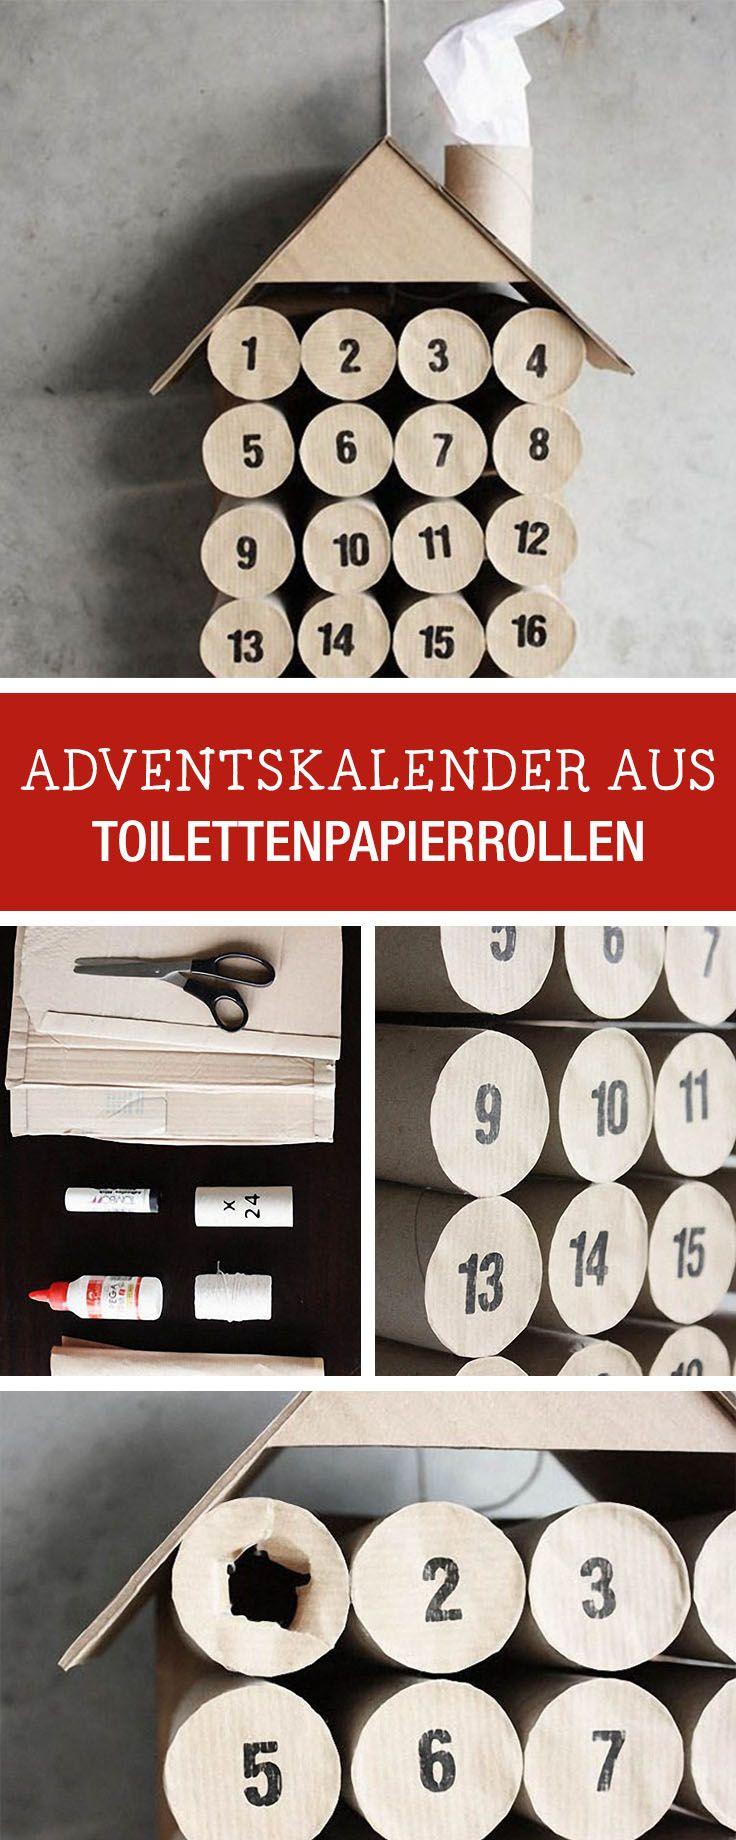 DIY-Anleitung für einen Adventskalender aus Toilettenpapierrollen / last minute advents calendar made of paper rolls via DaWanda.com